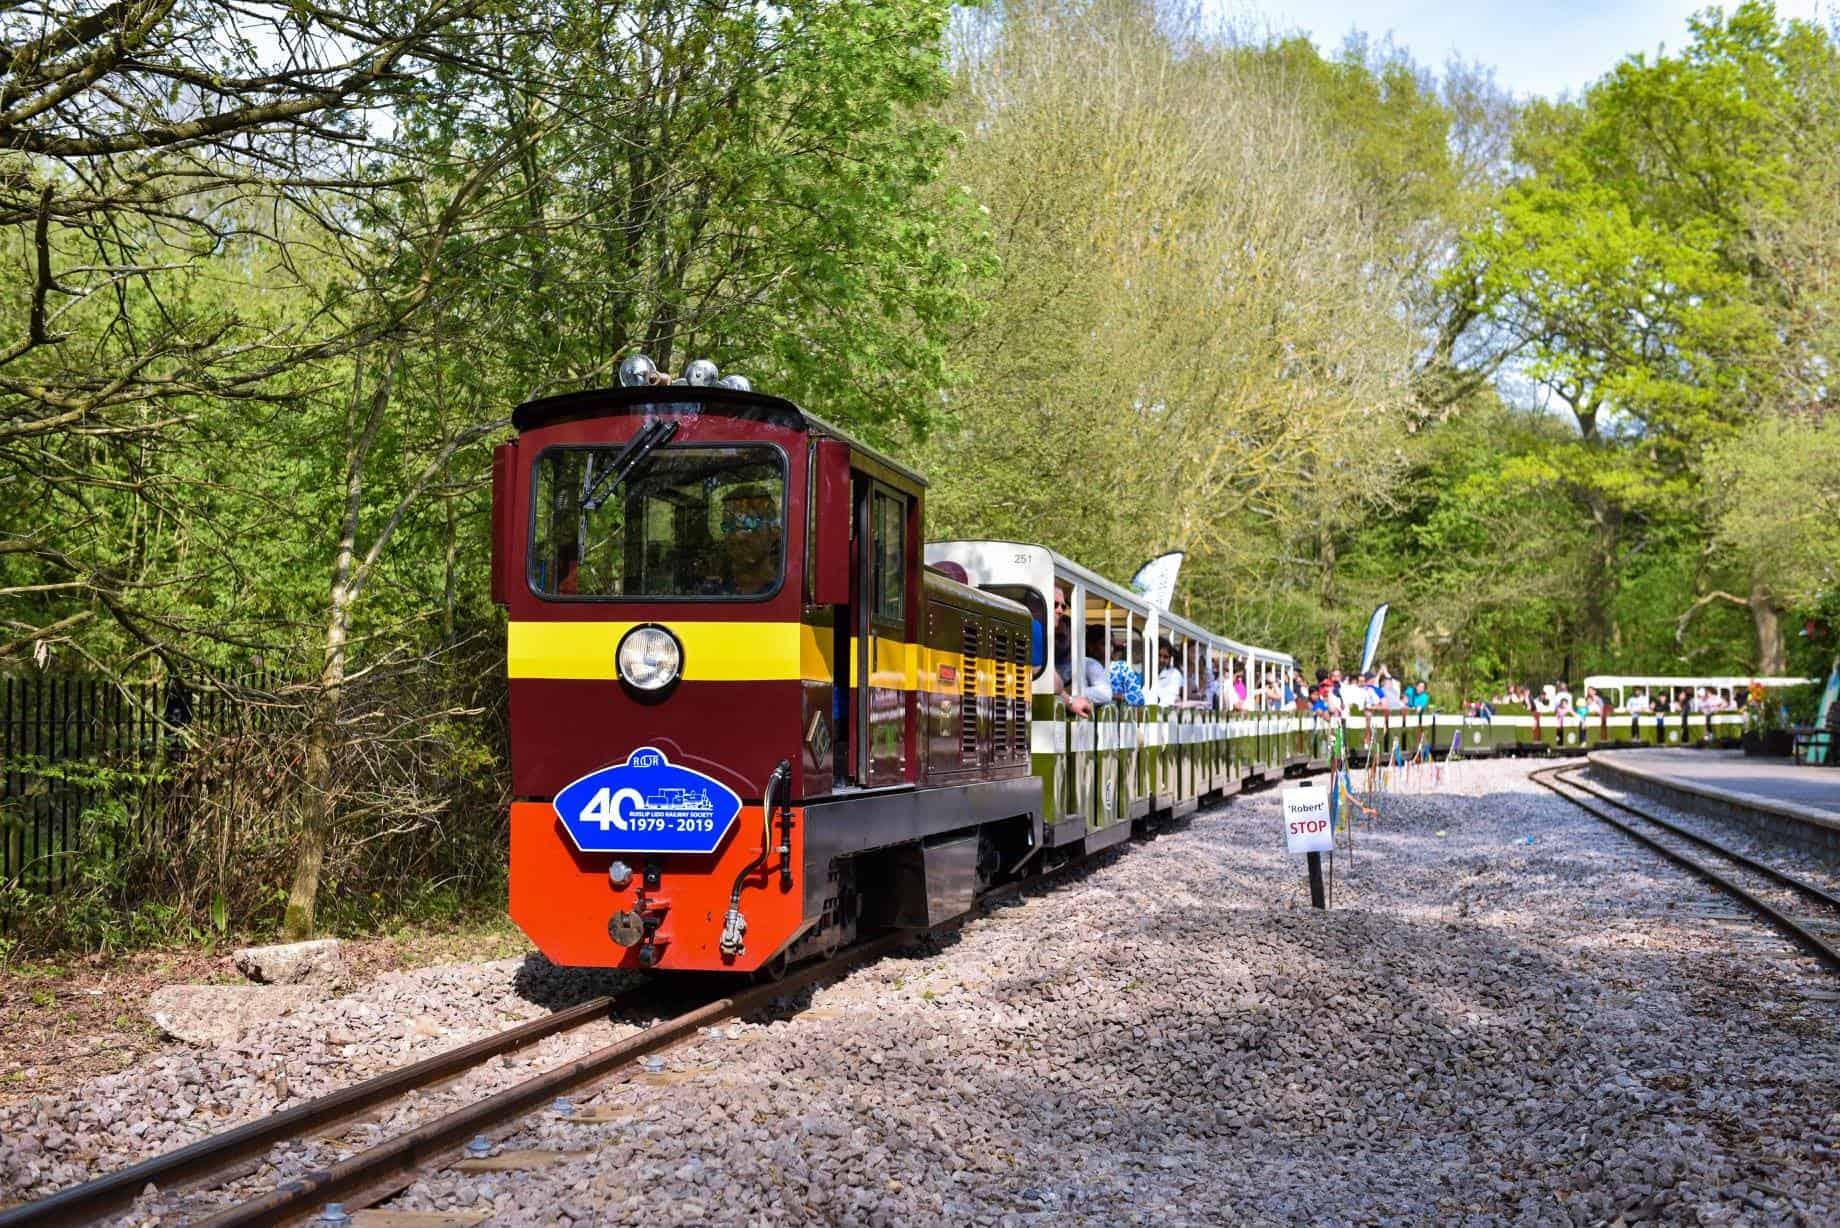 Ruislip Lido Railway